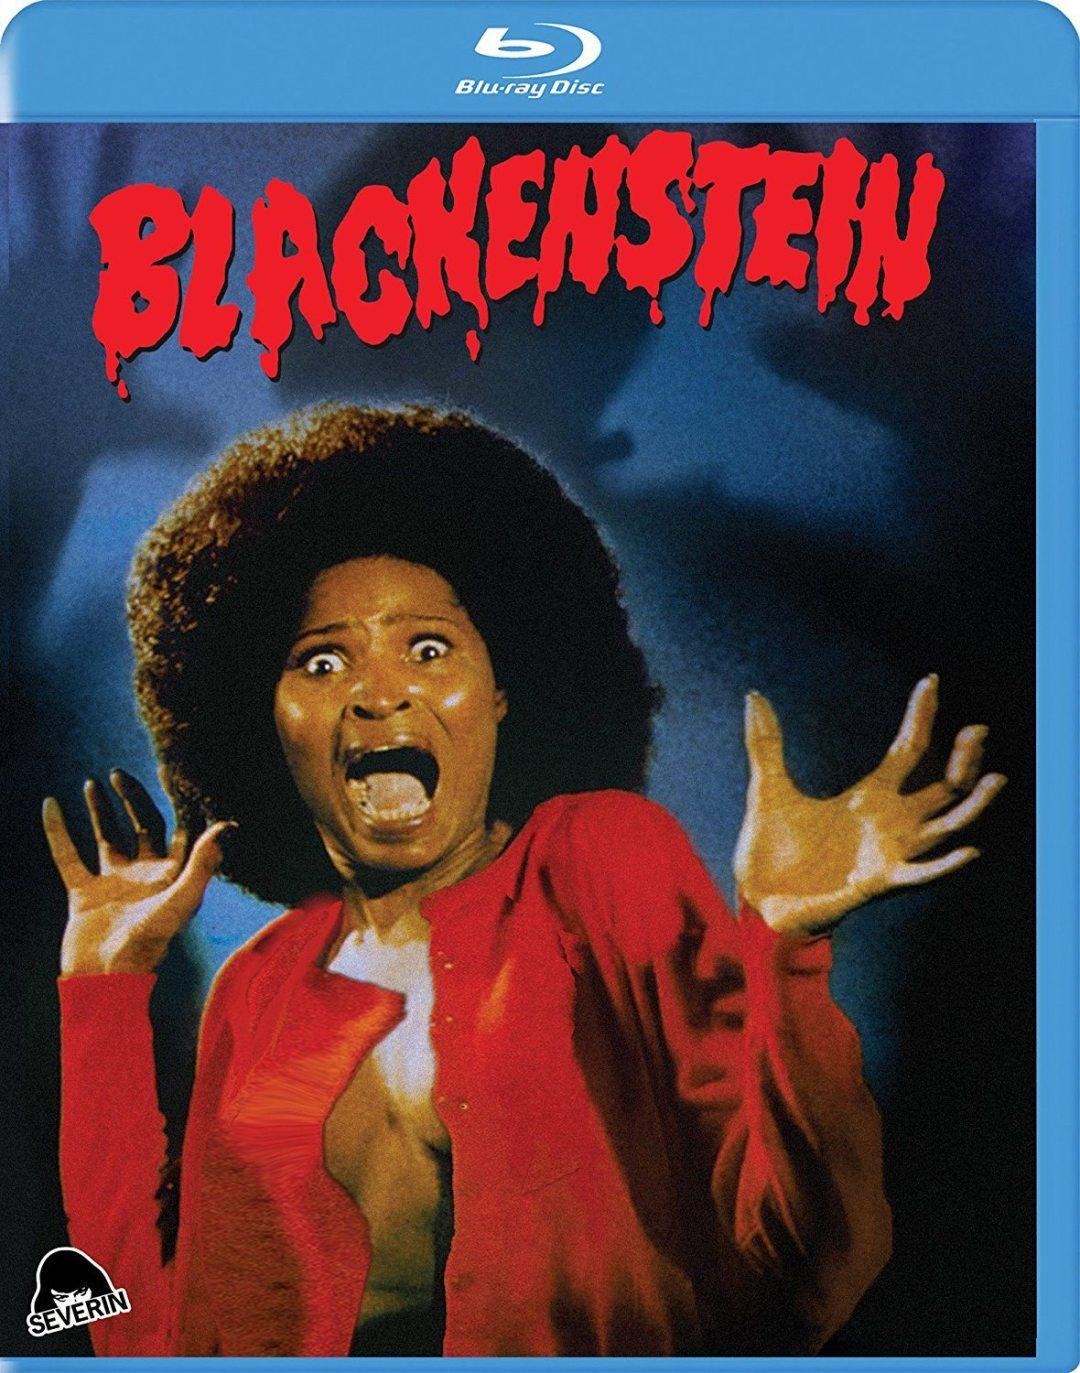 Blackenstein – Blu-ray/DVD Review